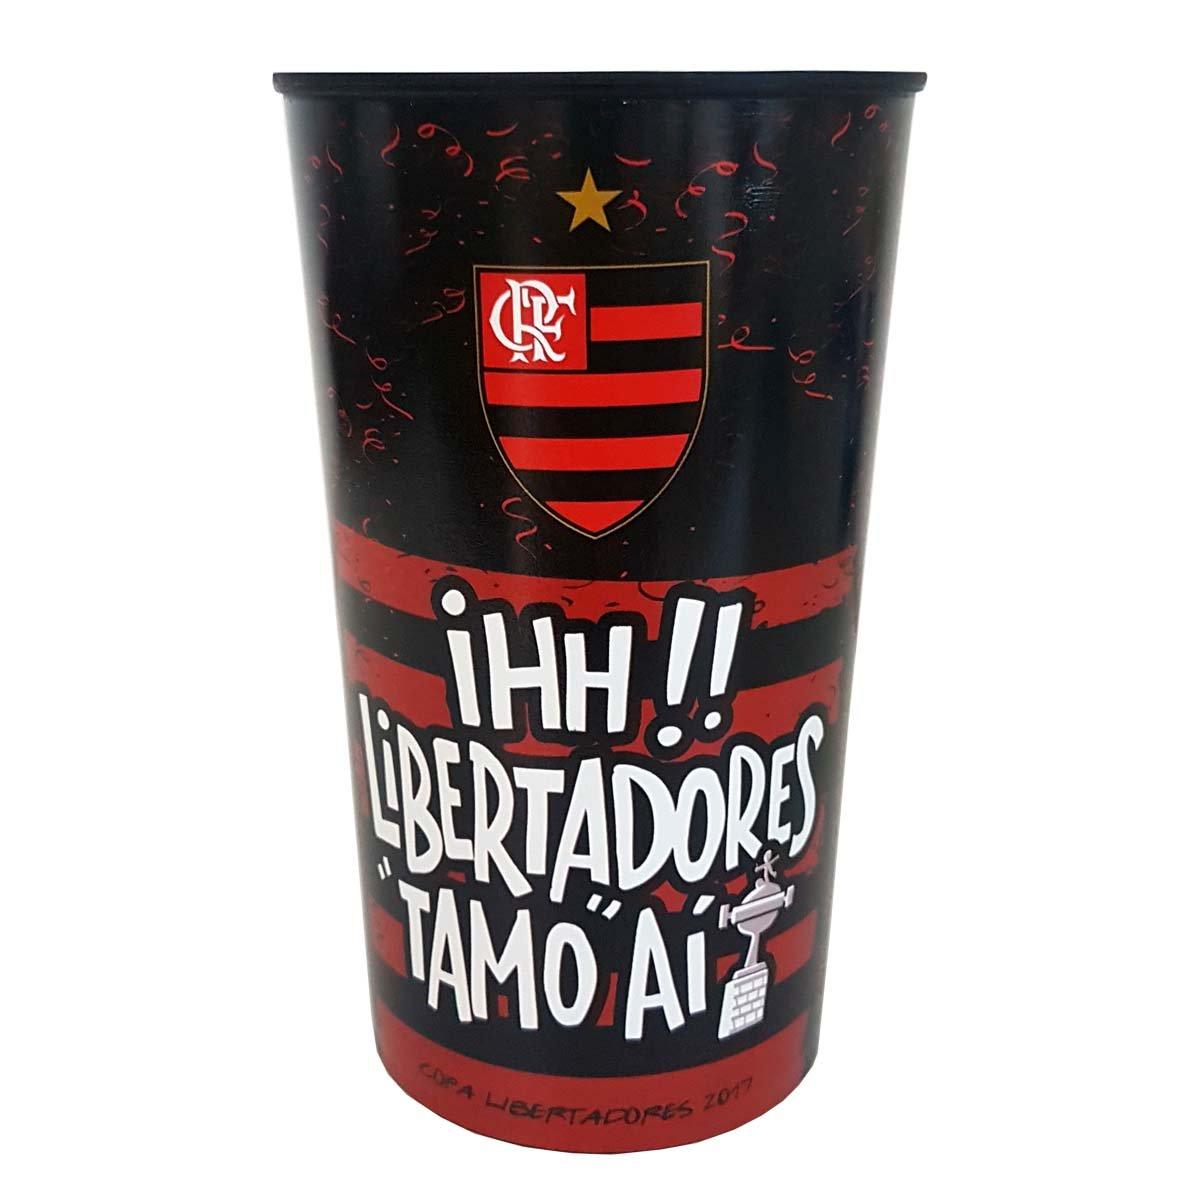 71dd680db1 Copo Flamengo Libertadores - Compre Agora